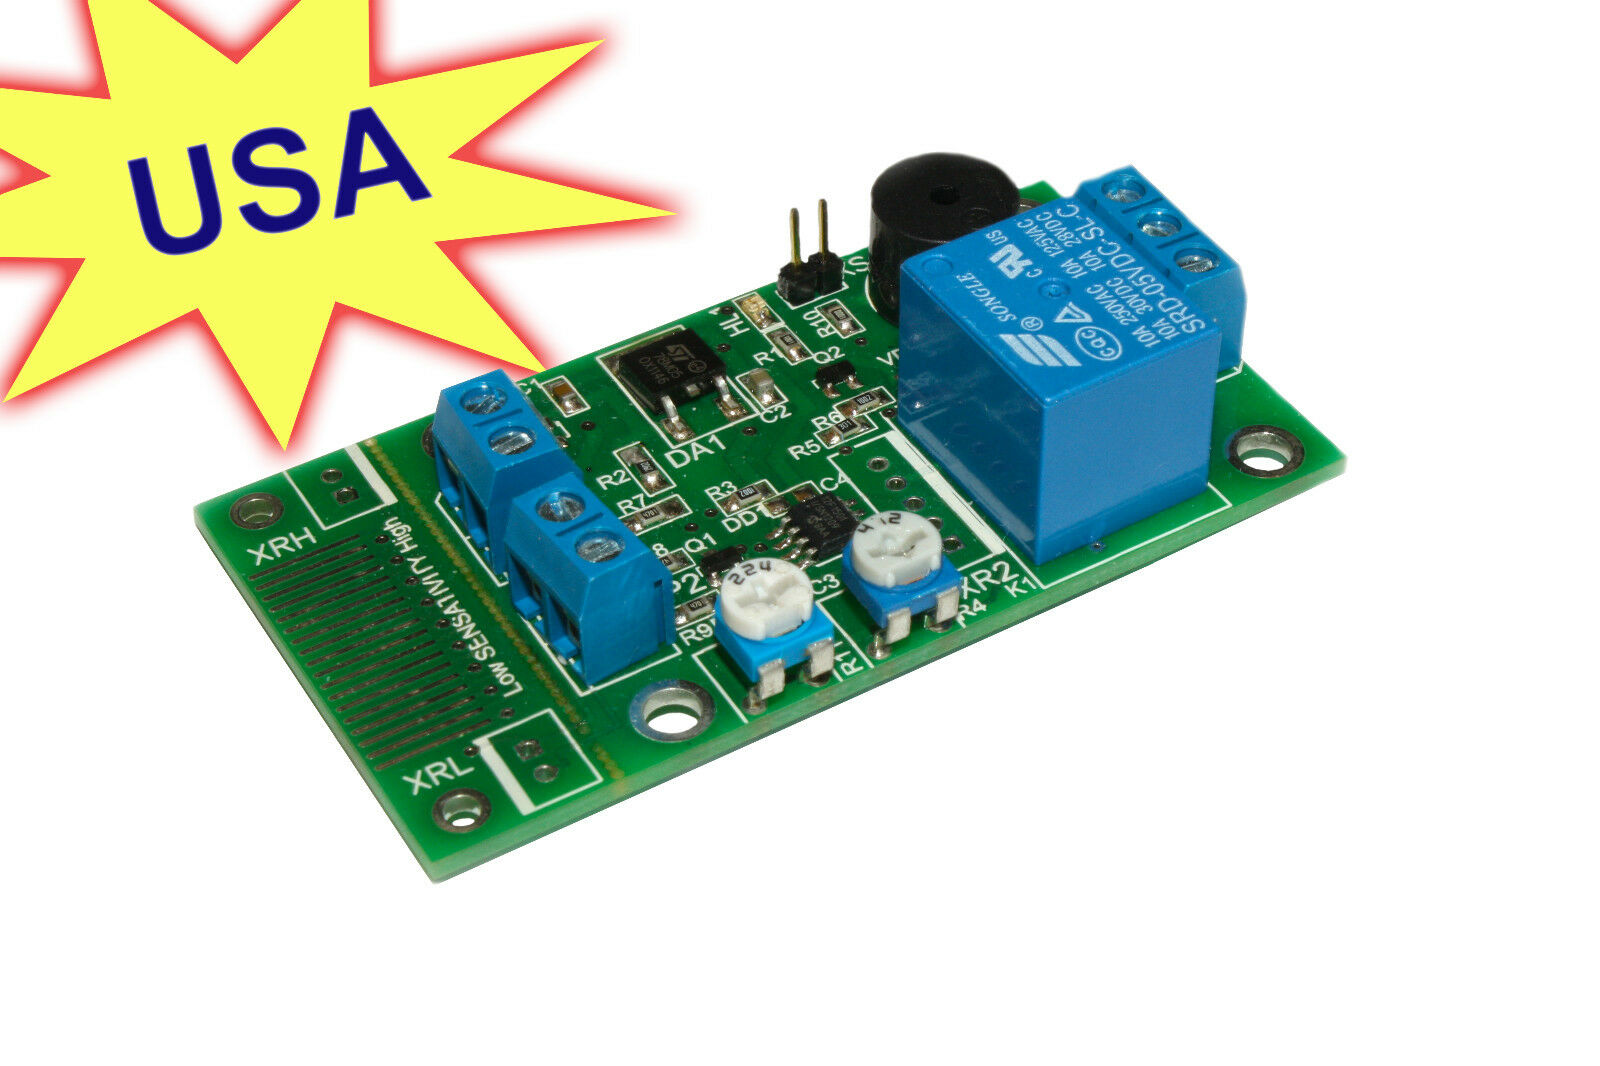 Digital Water Rain Sensor V 2 0 Leak Flood Detector Alarm PCB Module H 2 O